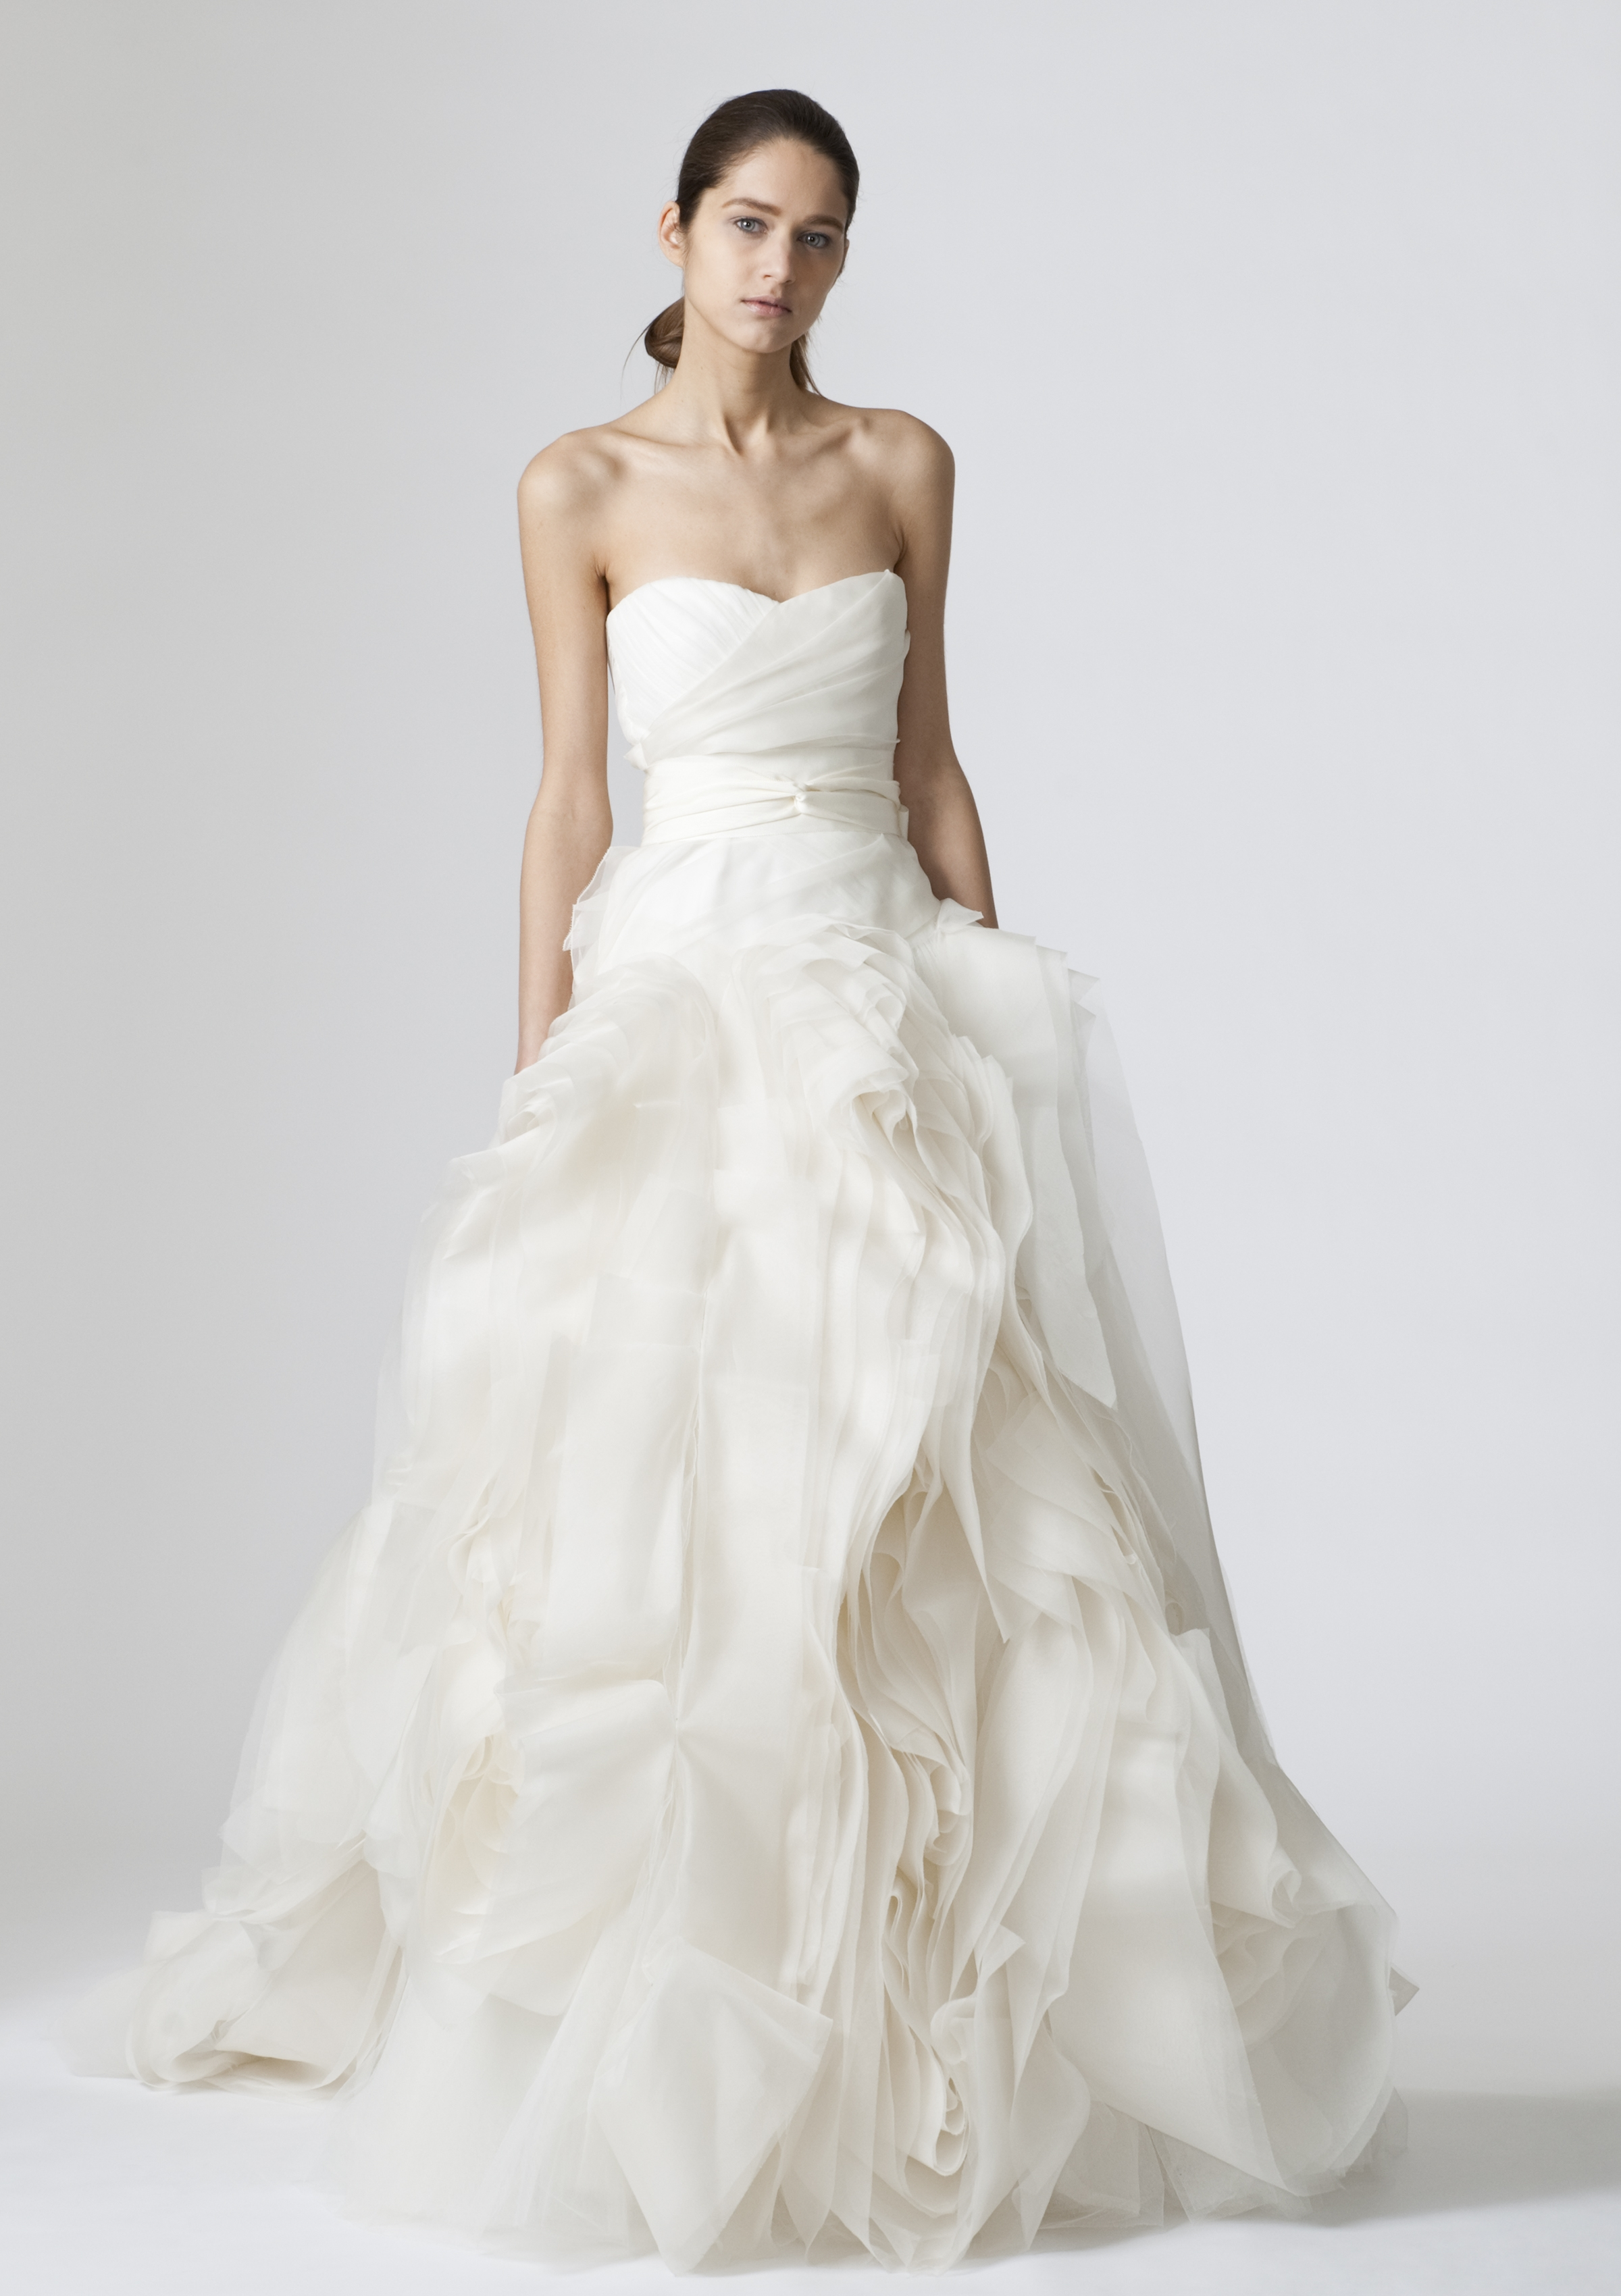 Diana  Onewedm. Big Wedding Dresses Ireland. Lace Wedding Dress Patterns. Ivory Wedding Dresses Meaning. Romantic Wedding Dress Designers